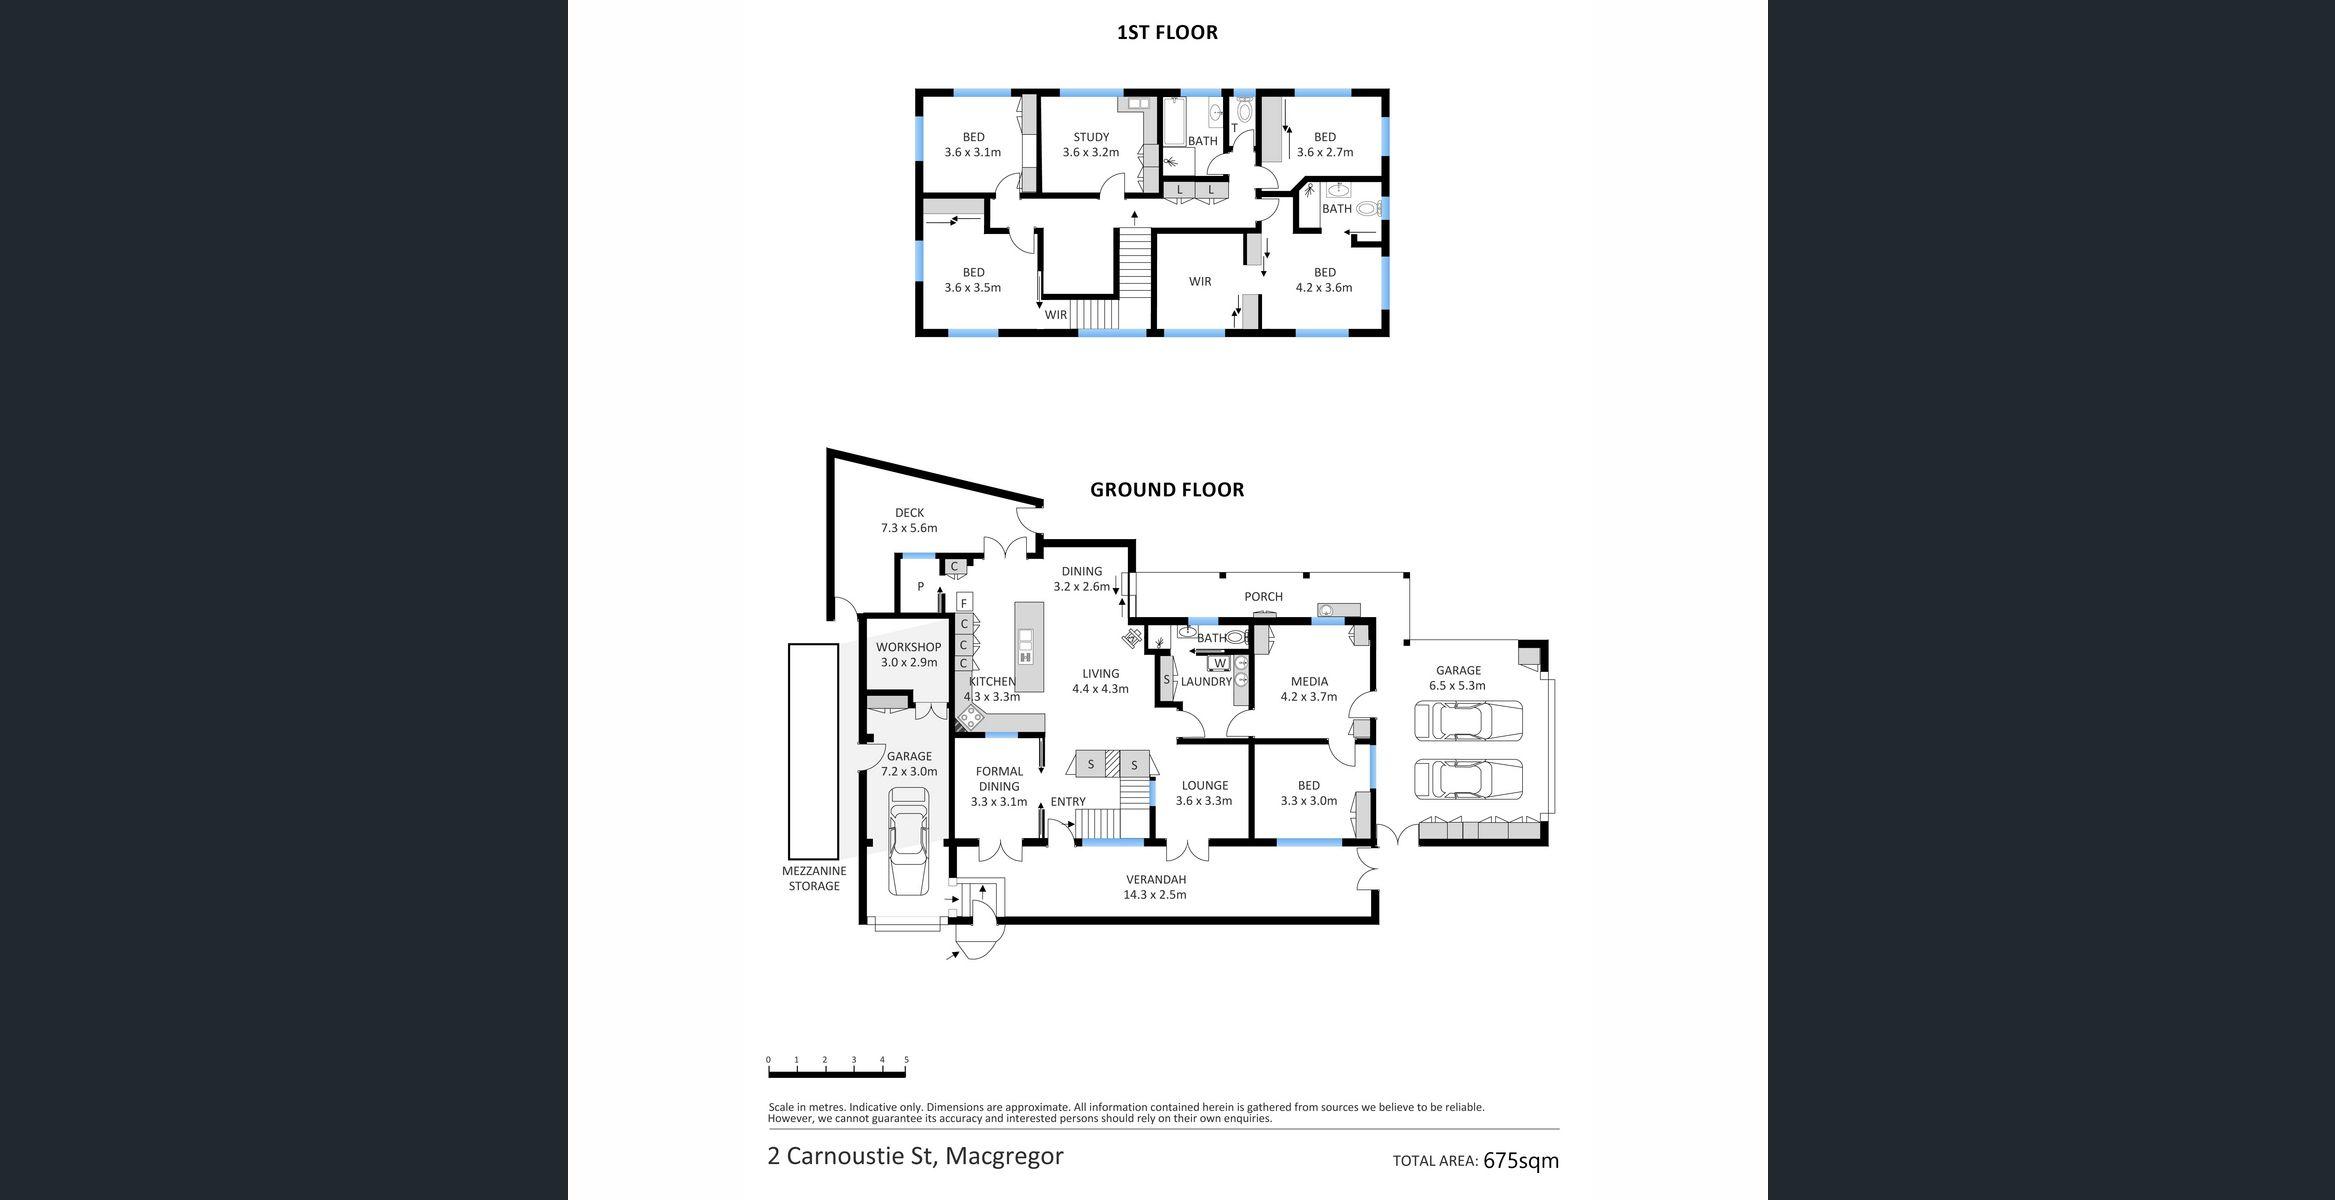 14605499__1603870096-21830-floorplan1.jpg